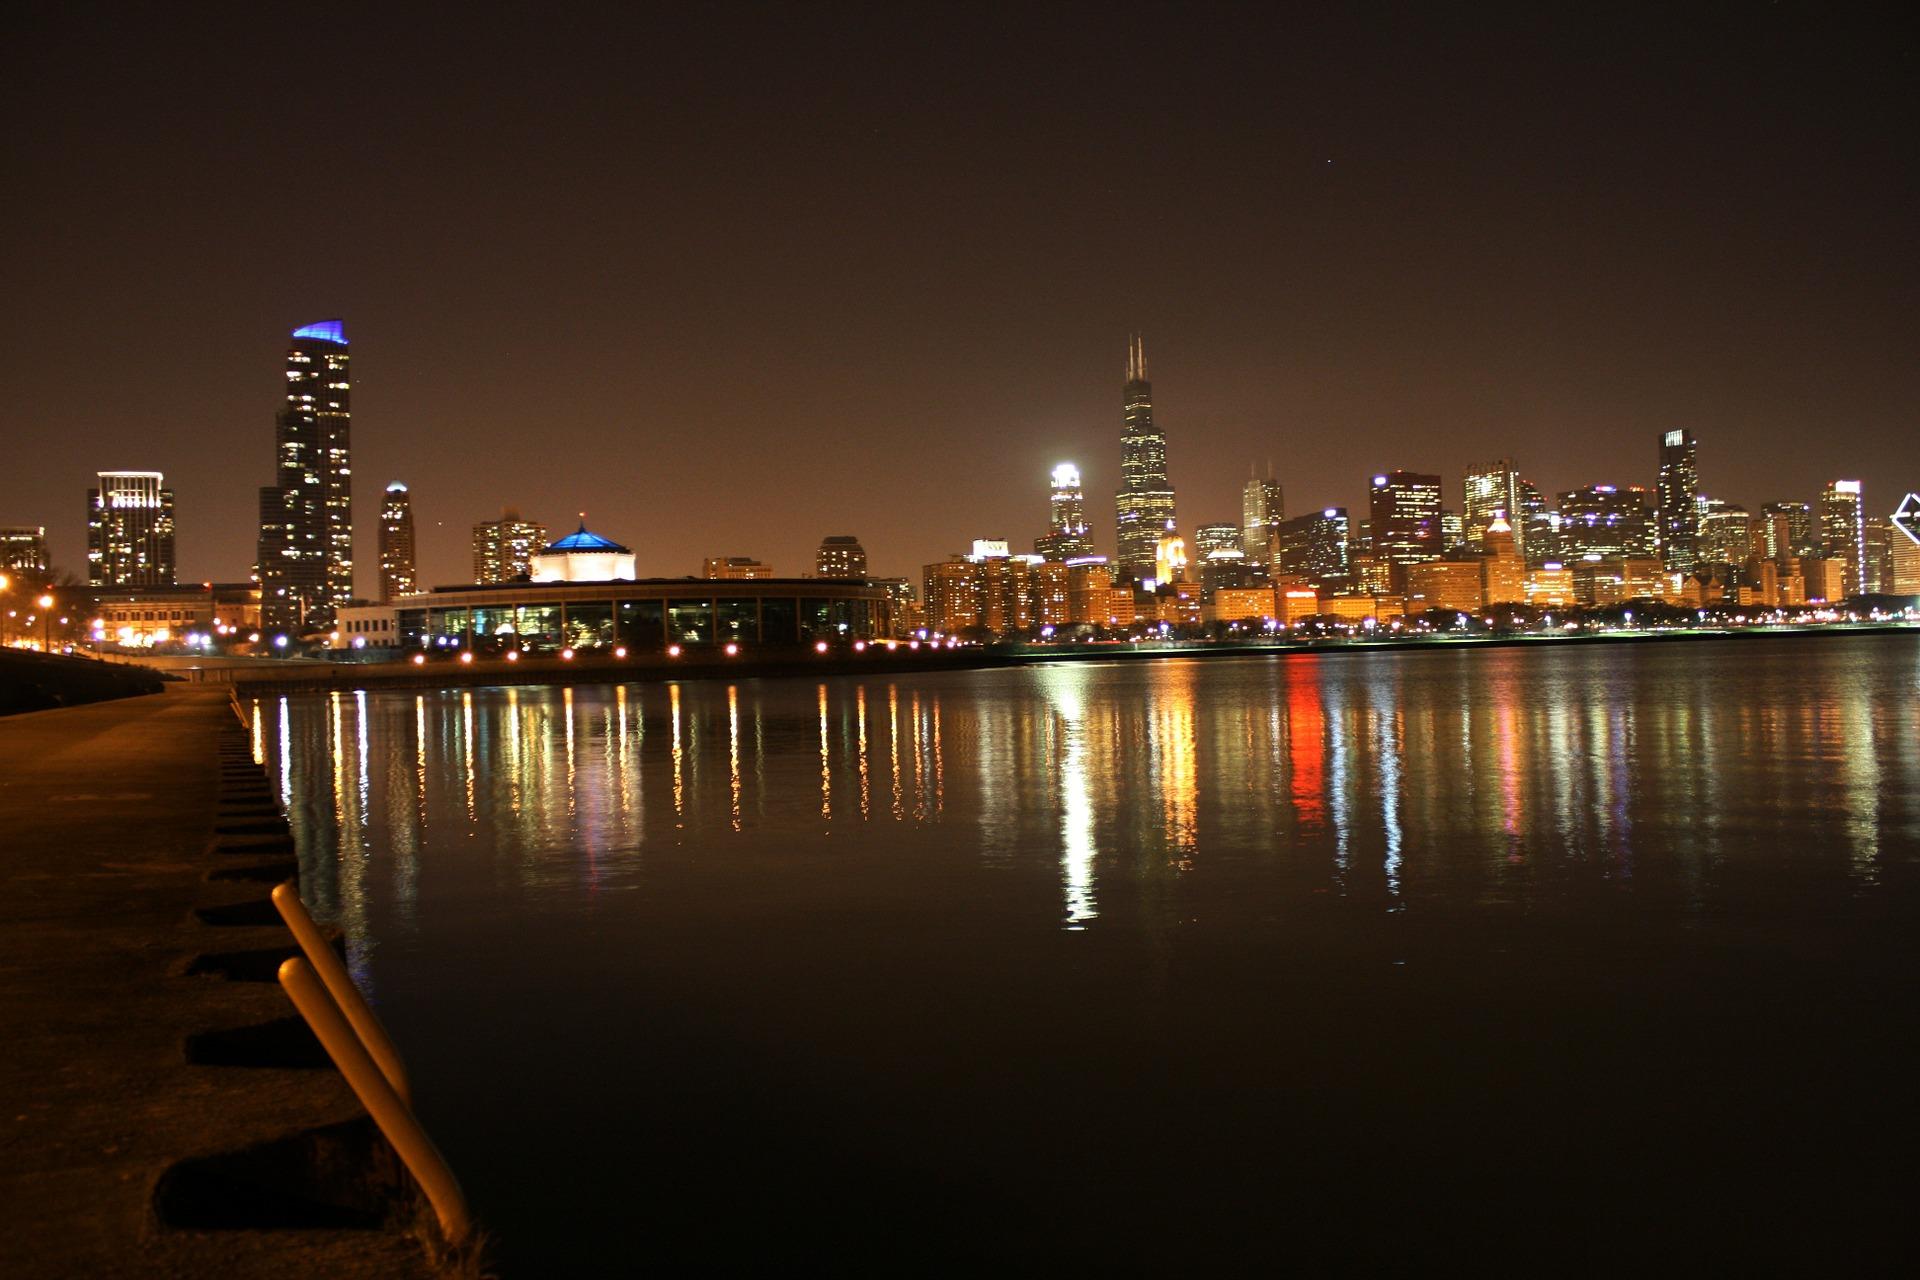 chicago-night-75293_1920